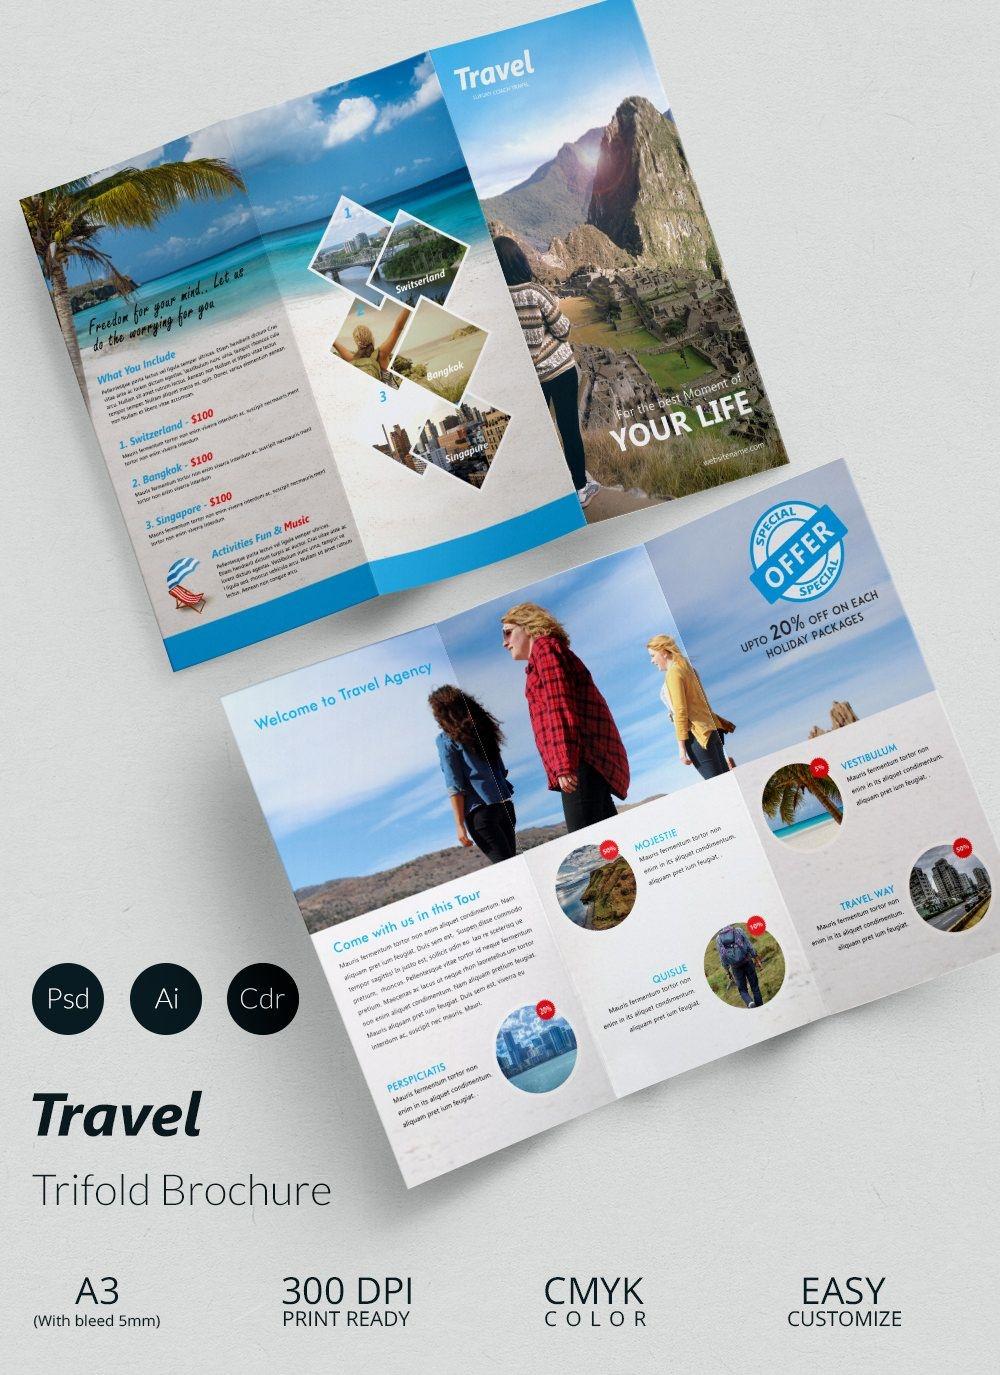 41+ Travel Brochure Templates - Free Sample, Example Format Download - Free Printable Brochure Maker Download